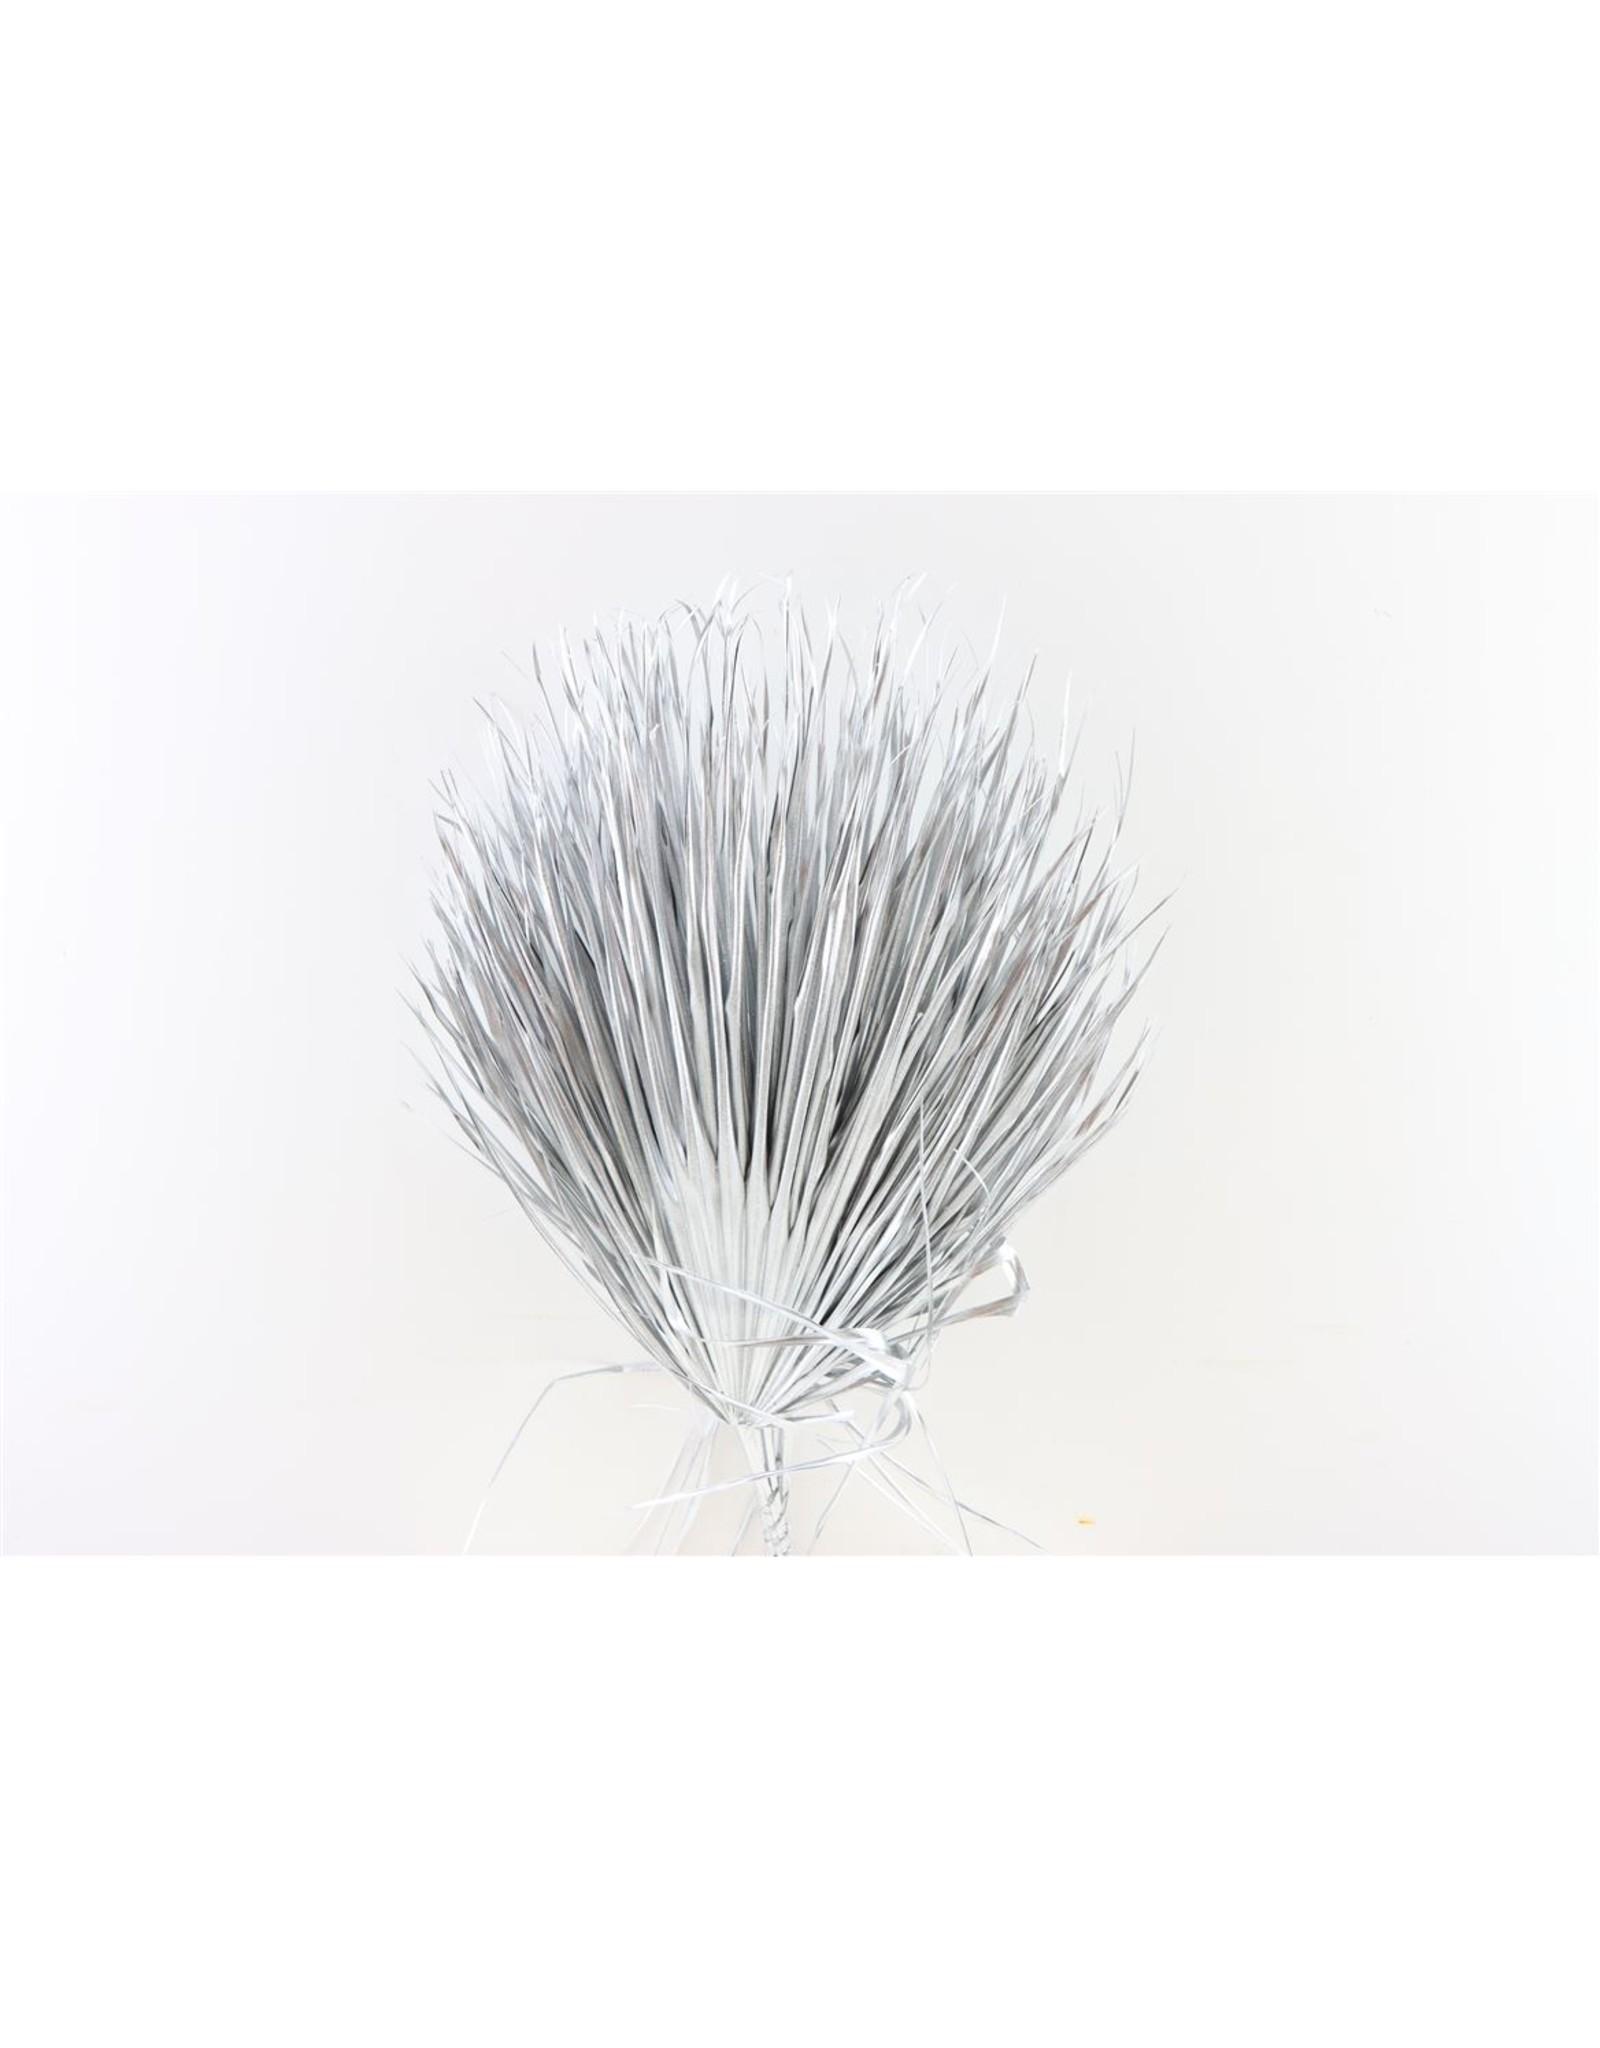 GF Dried Chamaerops (10tk) Metalic Silver Bunch x 2